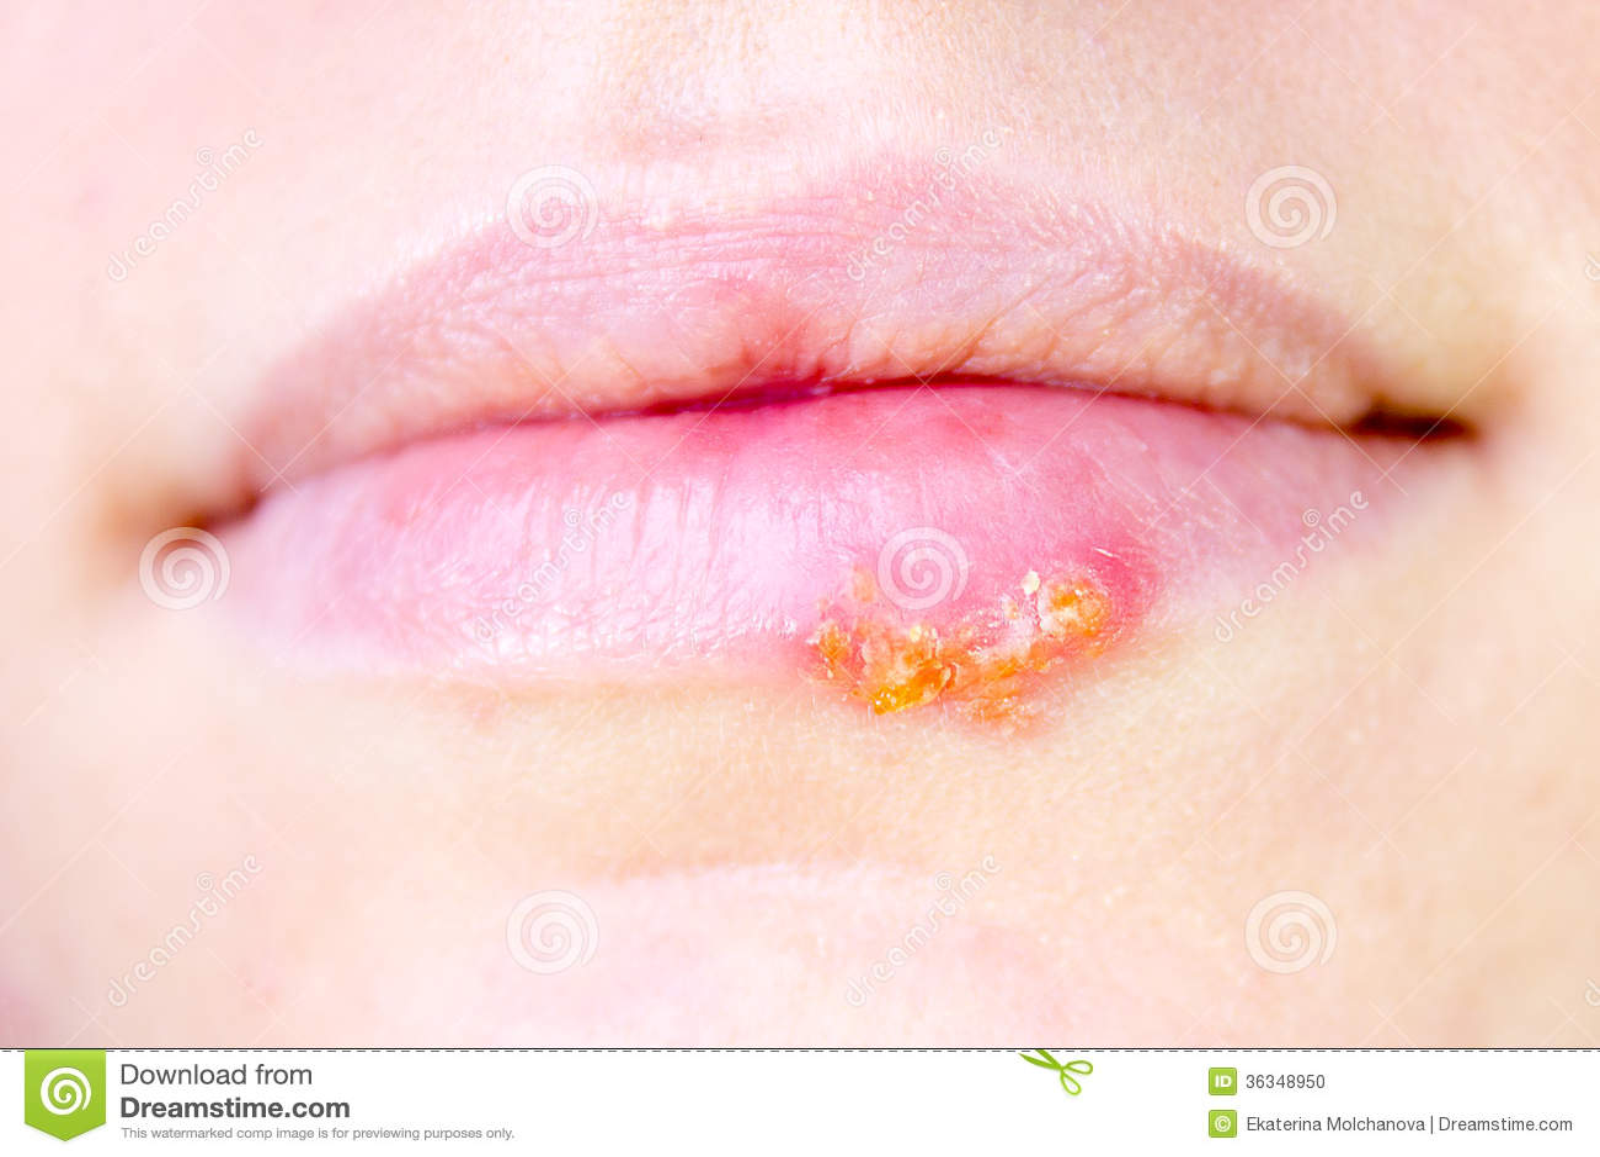 Herpes Virus On Female Lips Stock Photo - Image: 36348950